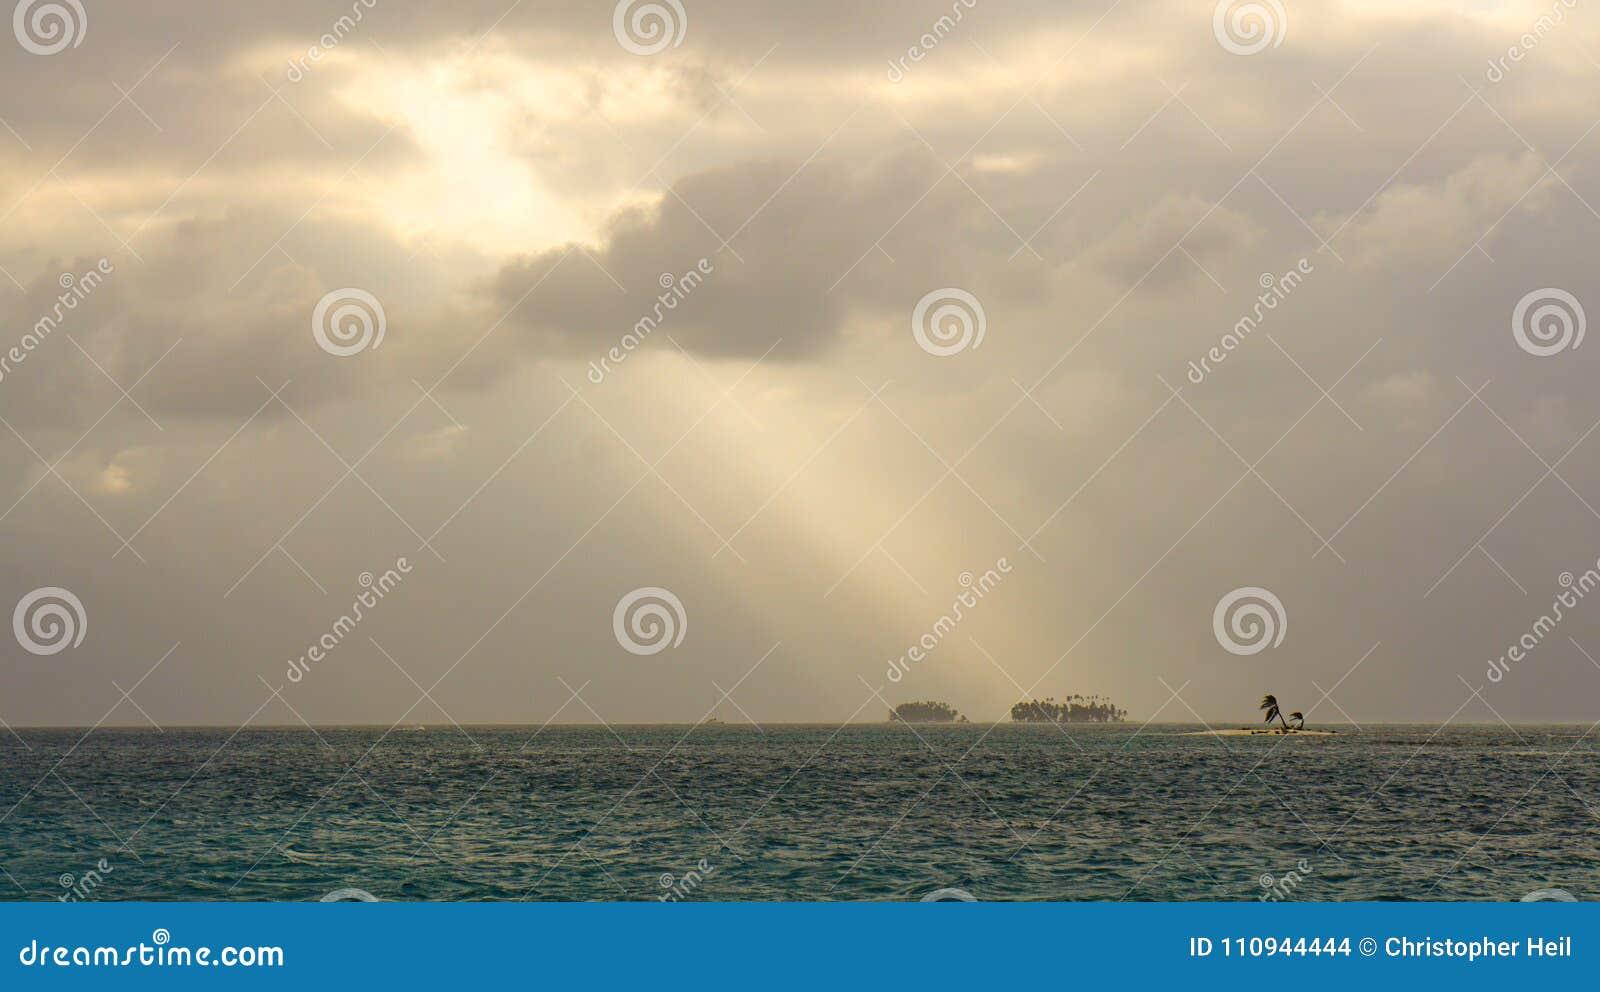 Uiterst klein eiland met palm in Caraïbisch San Blas Islands tussen Panama en Colombia